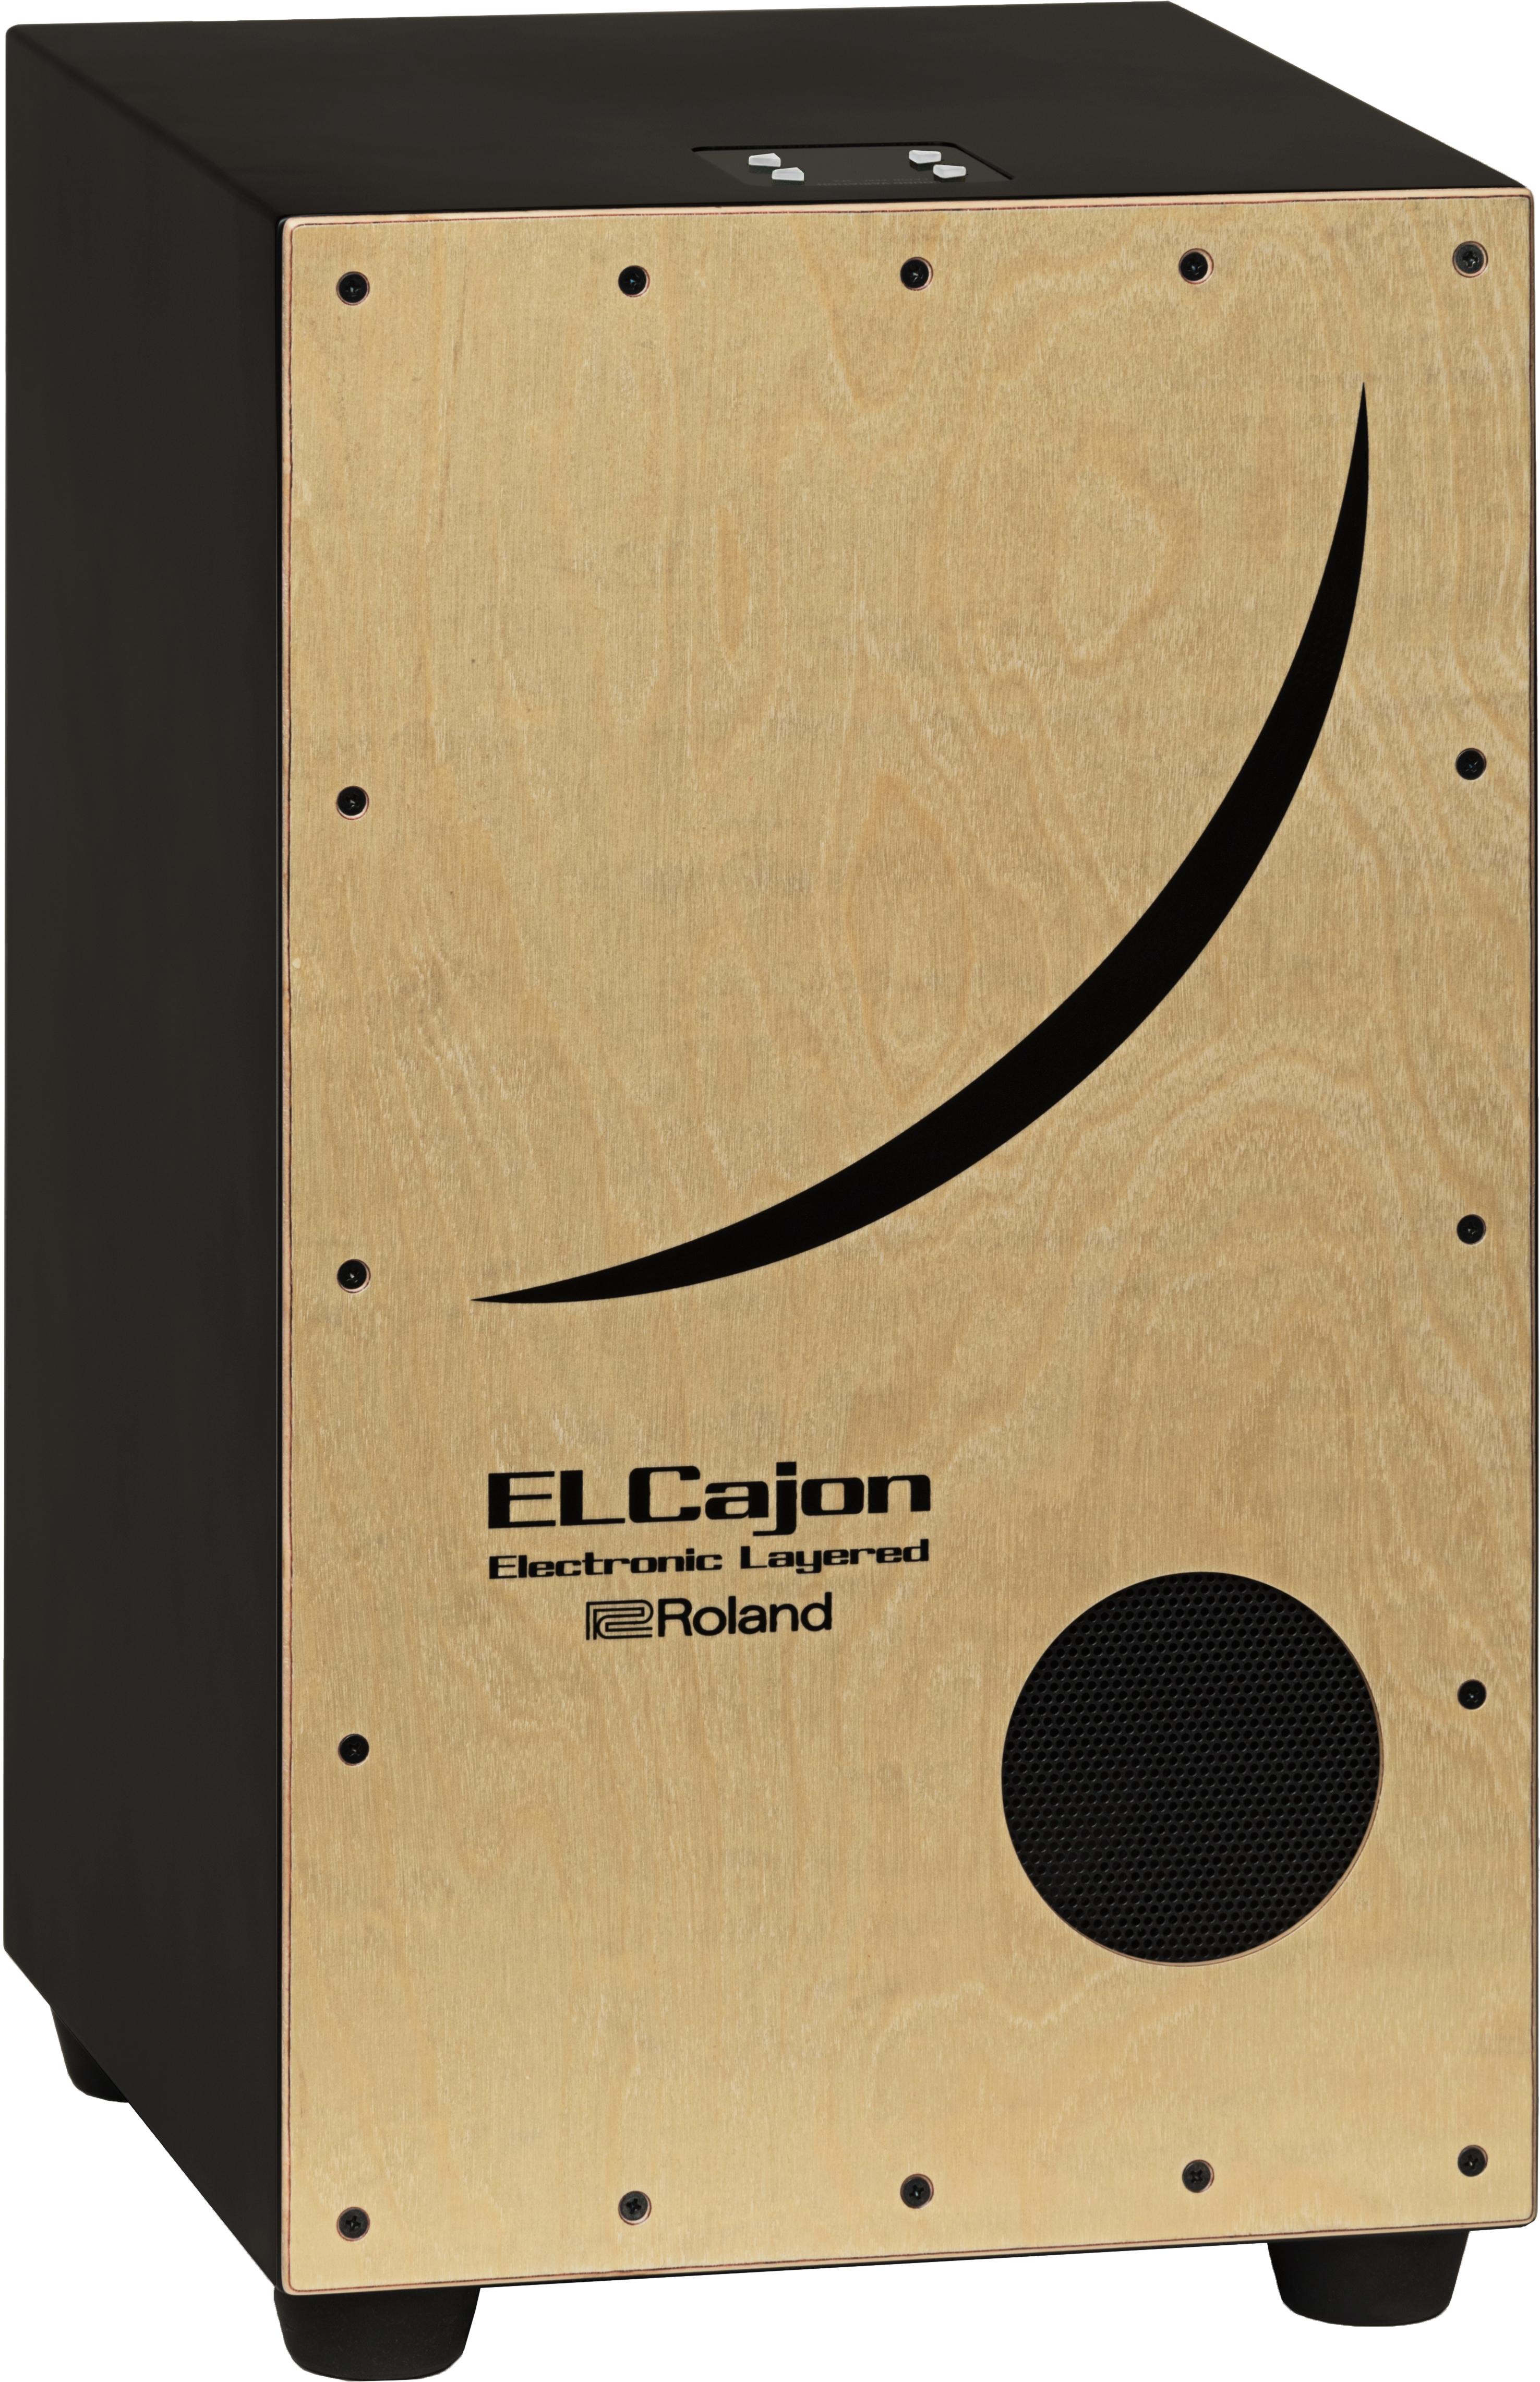 Batteries & Percussions - PERCUSSIONS - CAJONS - ROLAND - EC-10 - Royez Musik